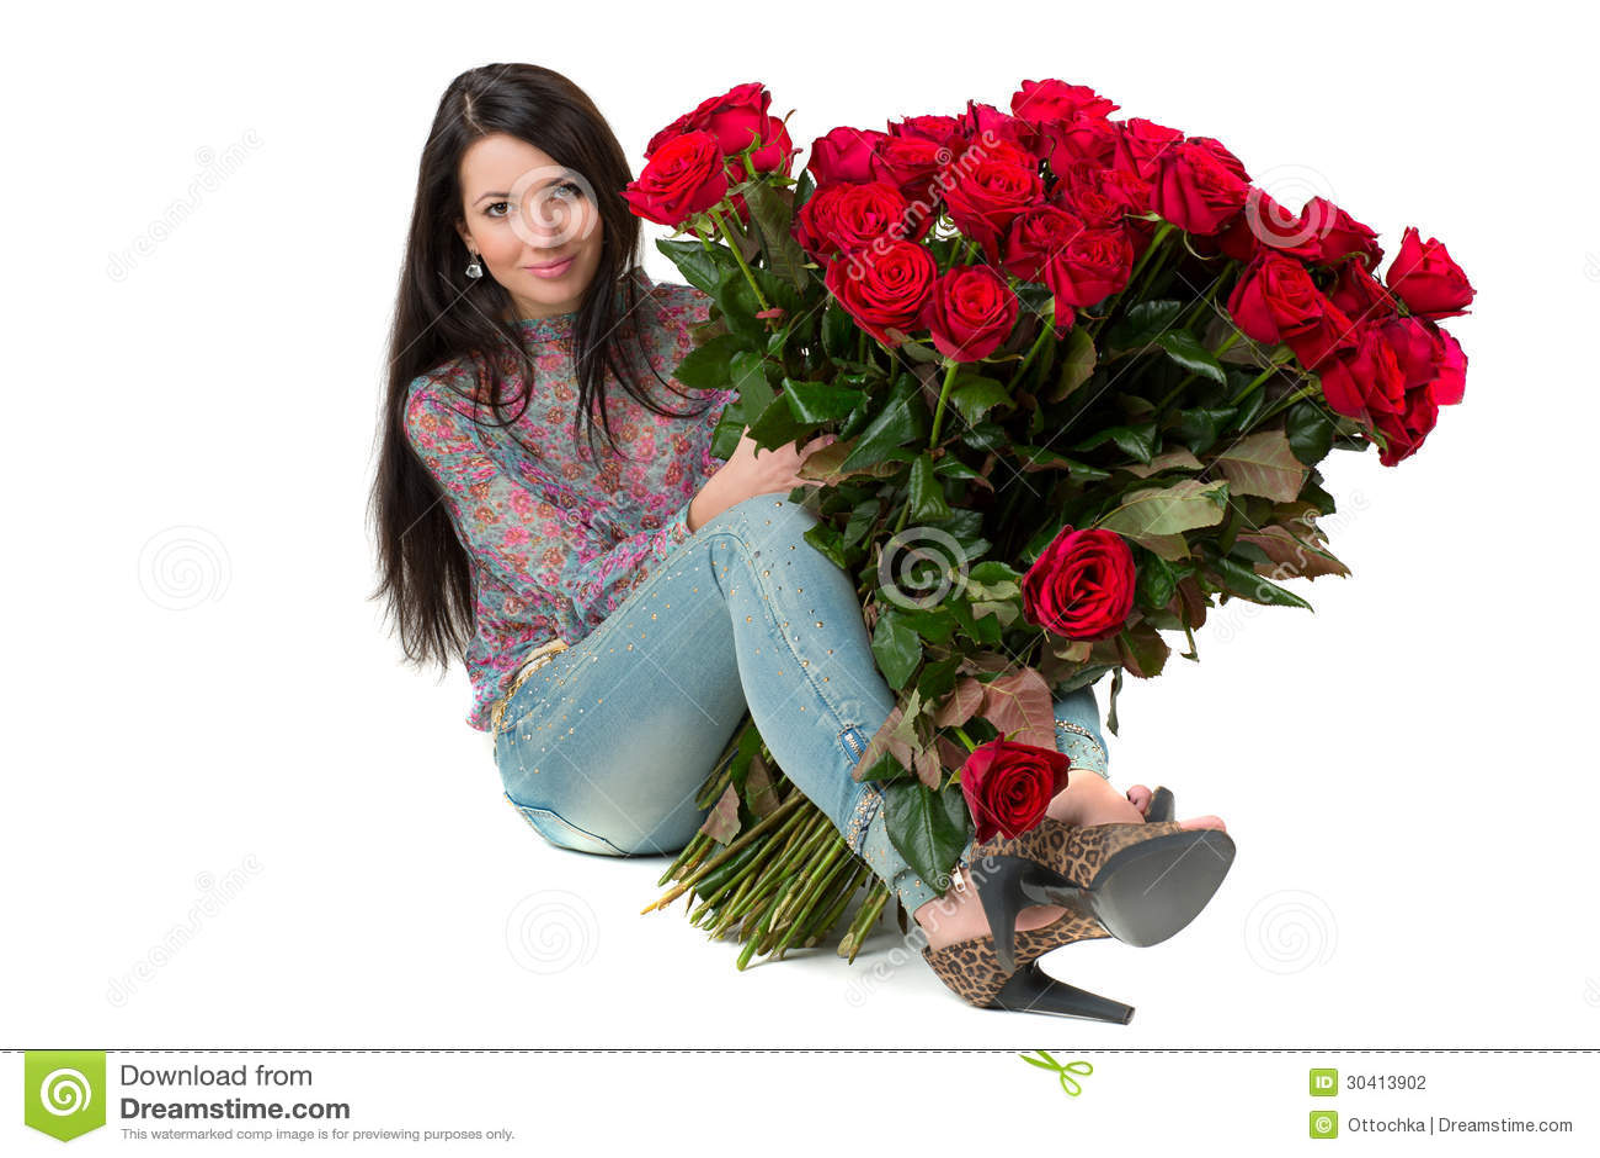 Брюнетка с цветами в руках на аву